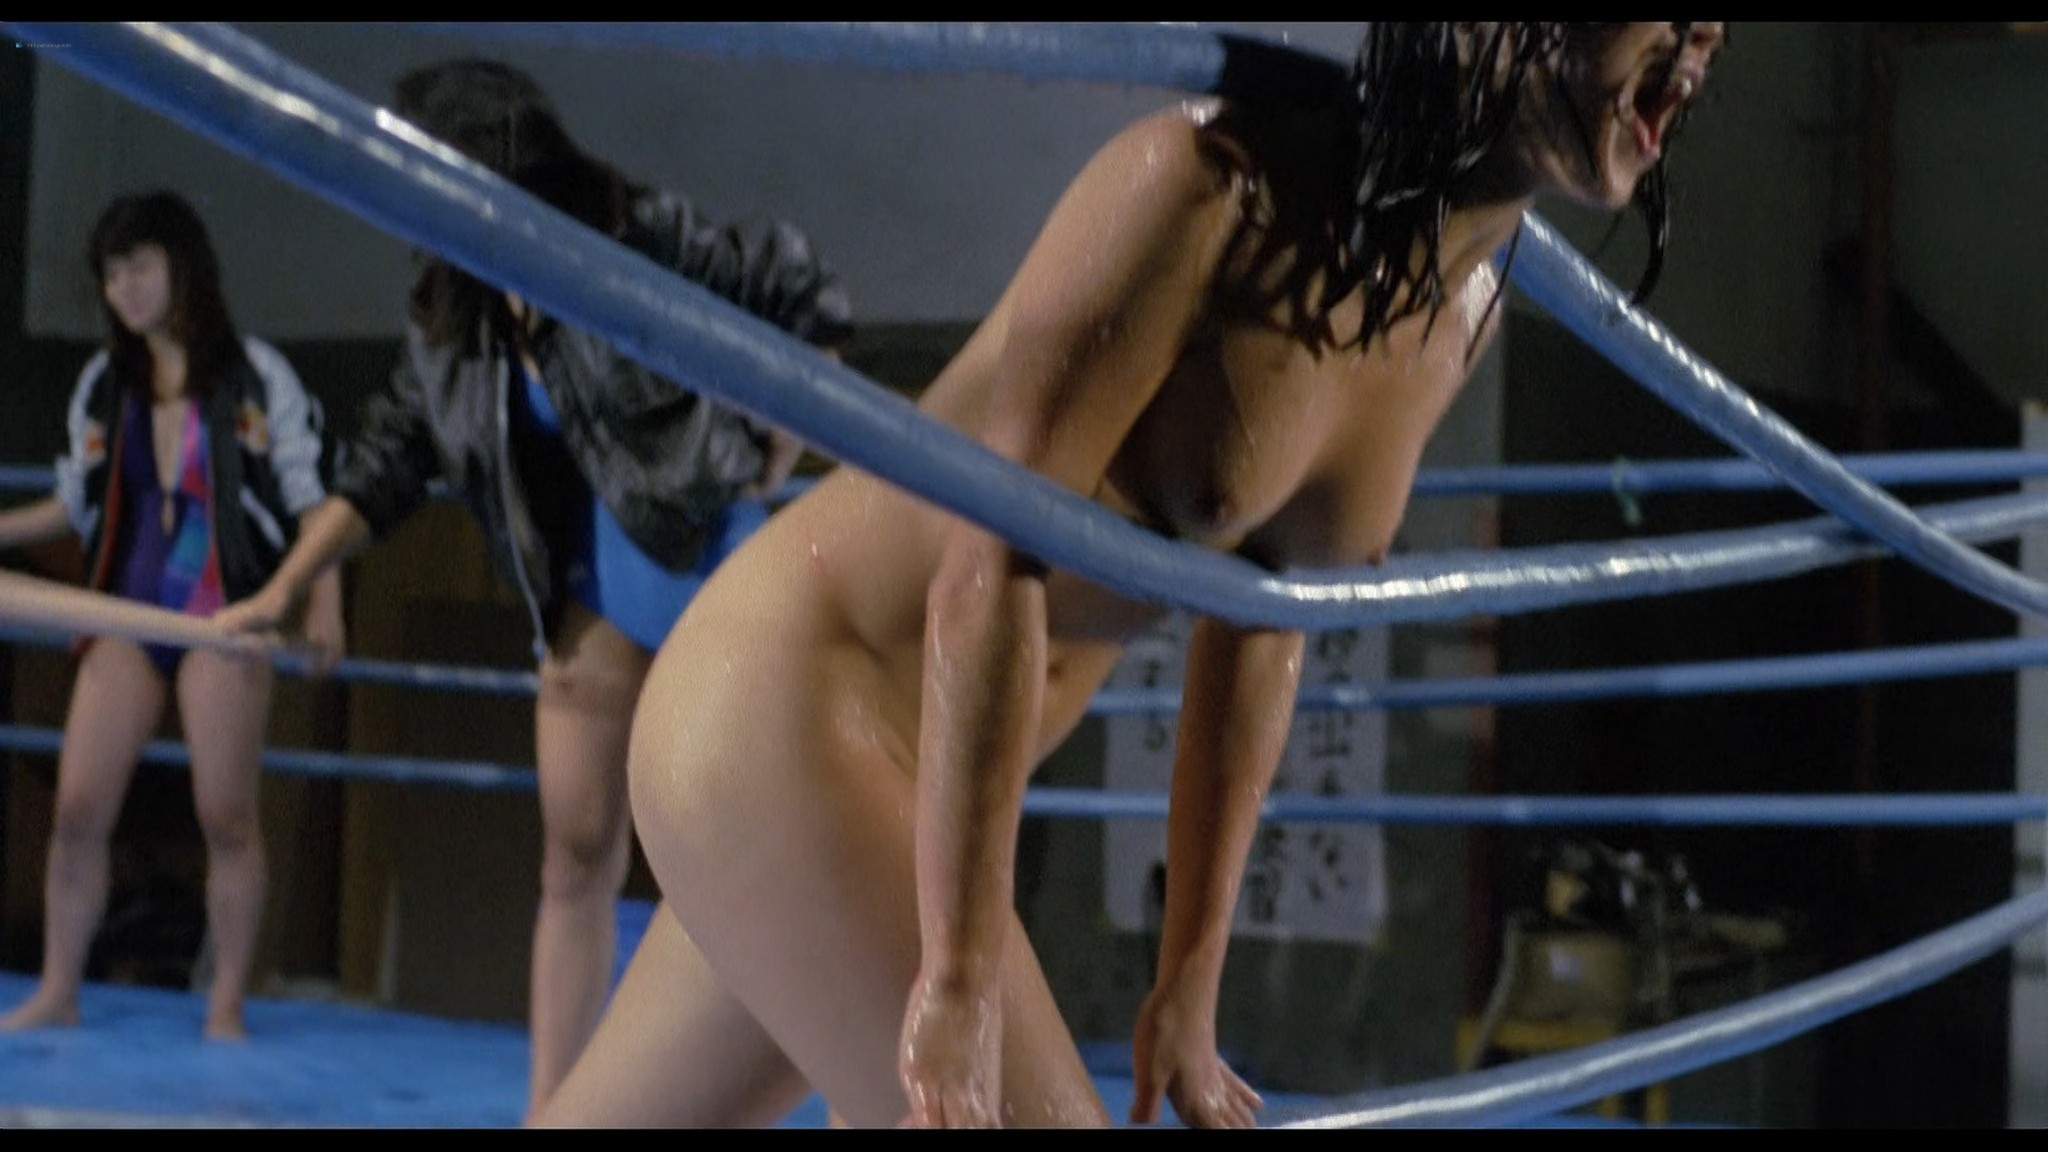 Natsuko Yamamoto nude Kaoru Oda nude lot of sex Beautiful Wrestlers Down for the Count JP 1984 1080p BluRay REMUX 2